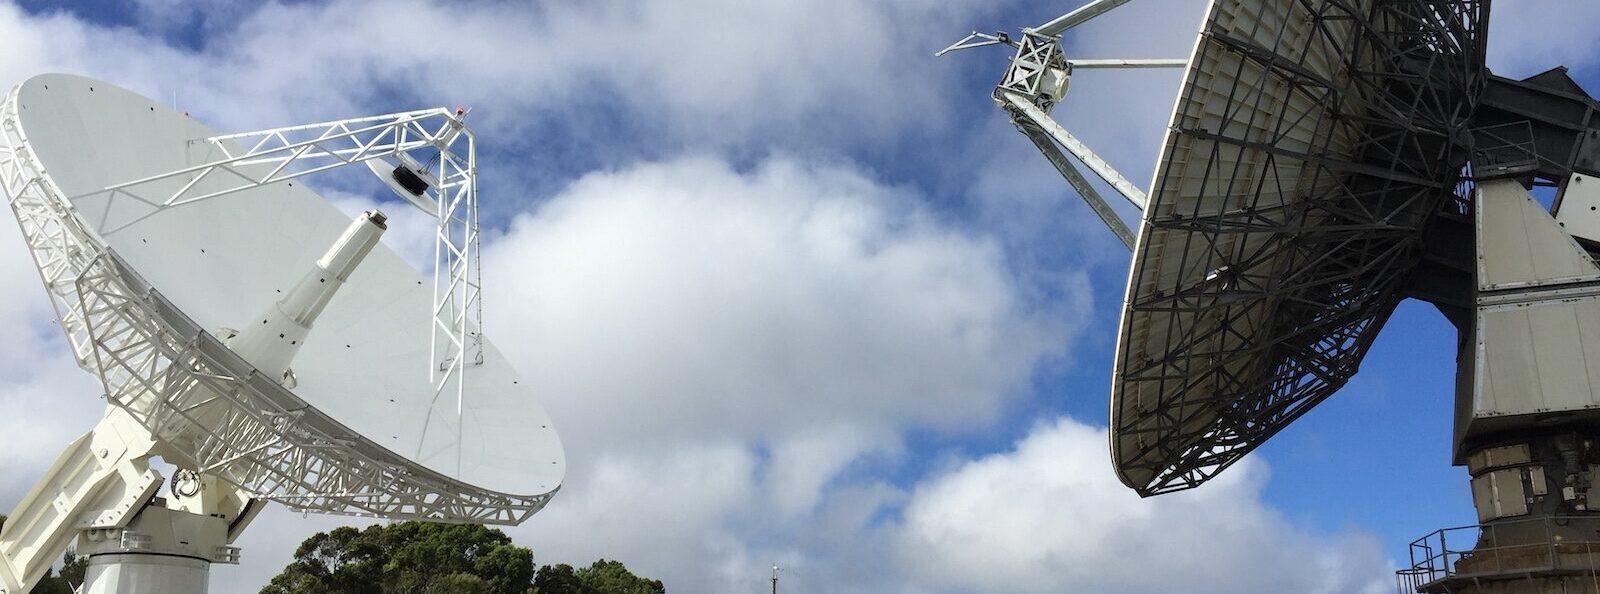 KPGO VGOS antenna in Hawaii